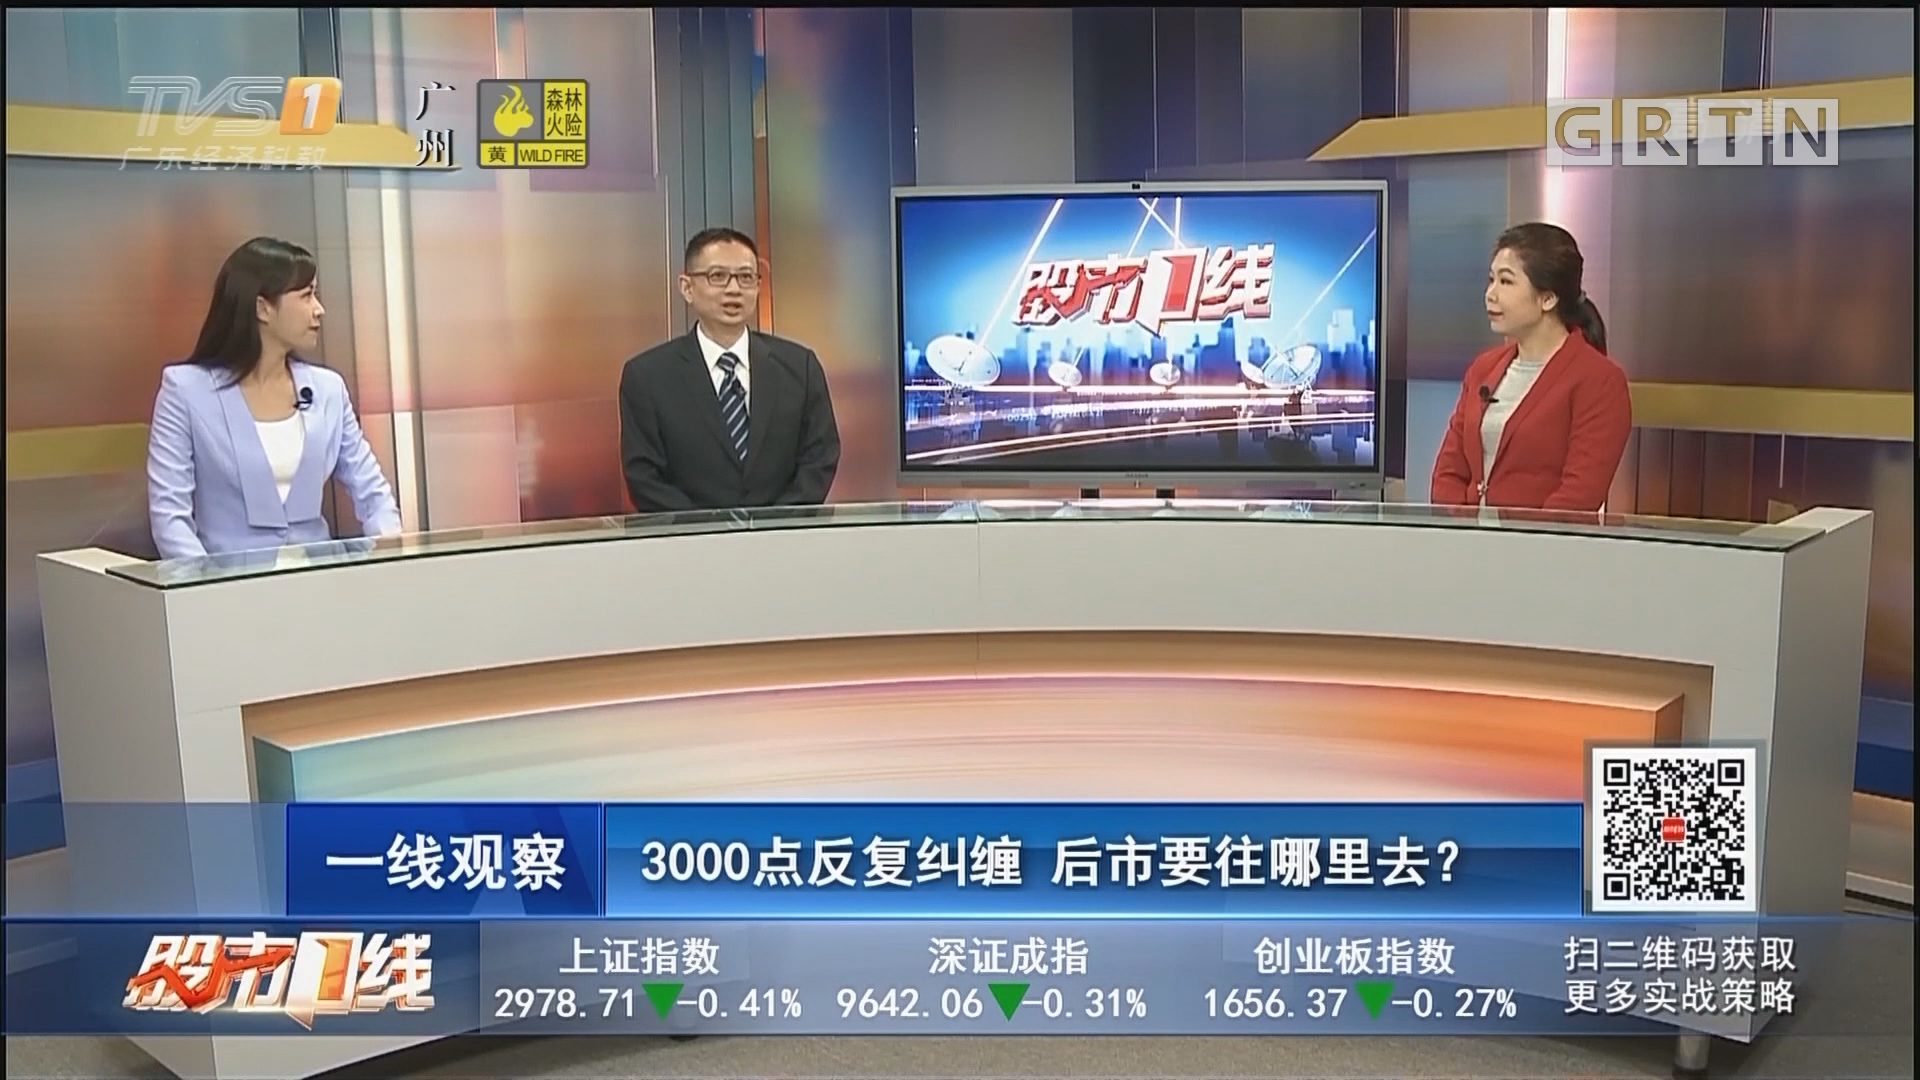 [HD][2019-10-16]股市一线:3000点反复纠缠 后市要往哪里去?